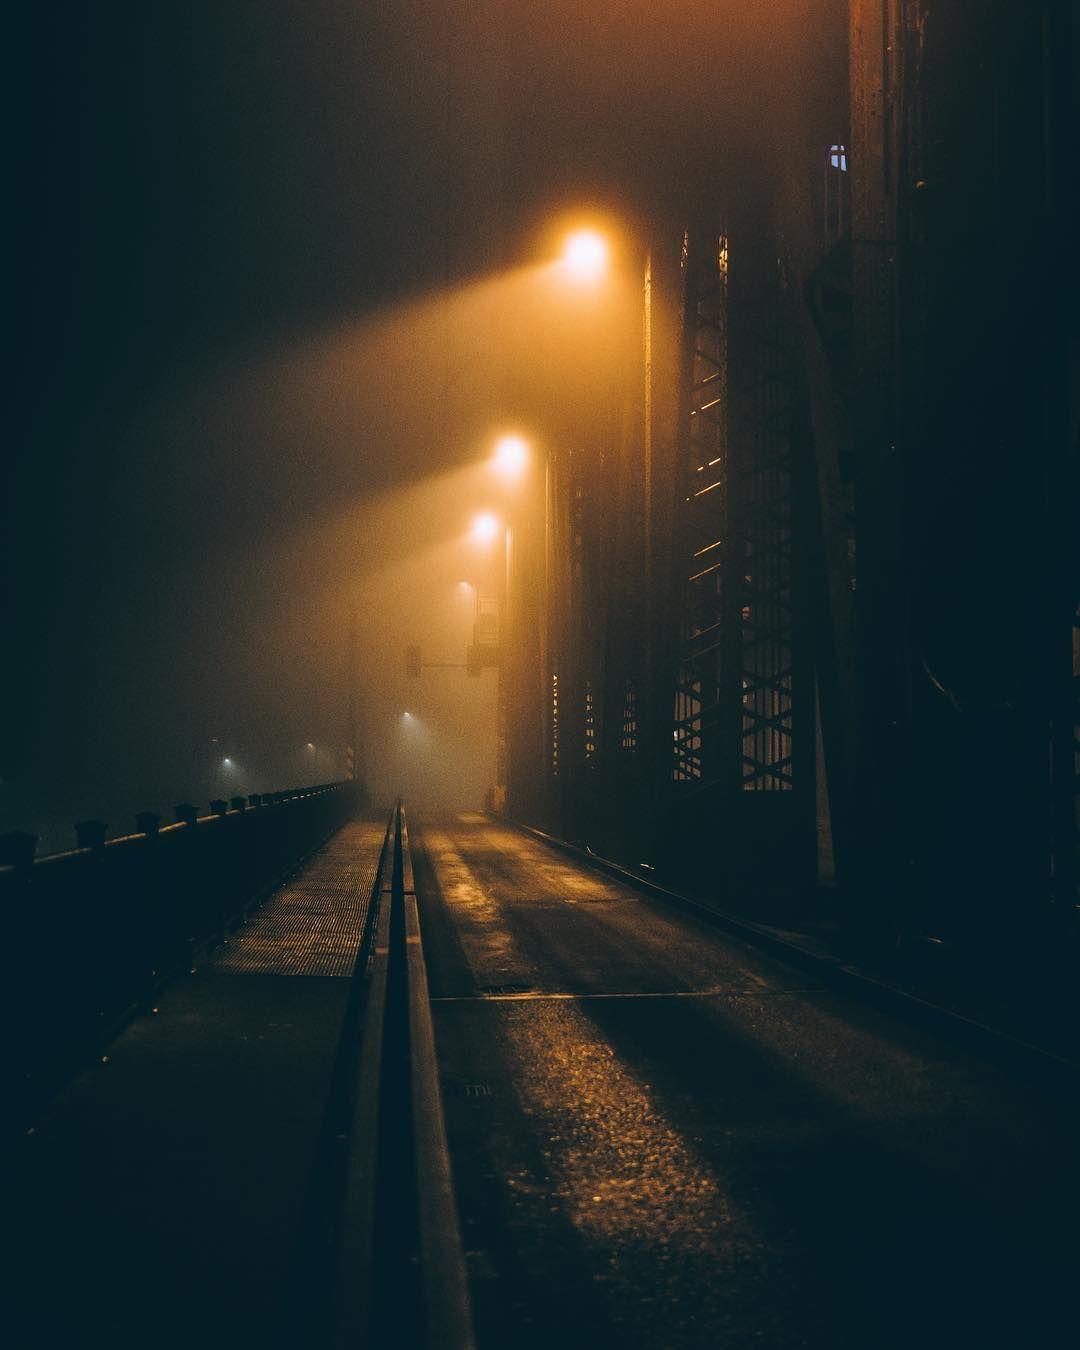 Portland Based Photographer Brian Crippe Captures Stunning Urban Shots Across The Us Night Landscape Urban Landscape Night Photography